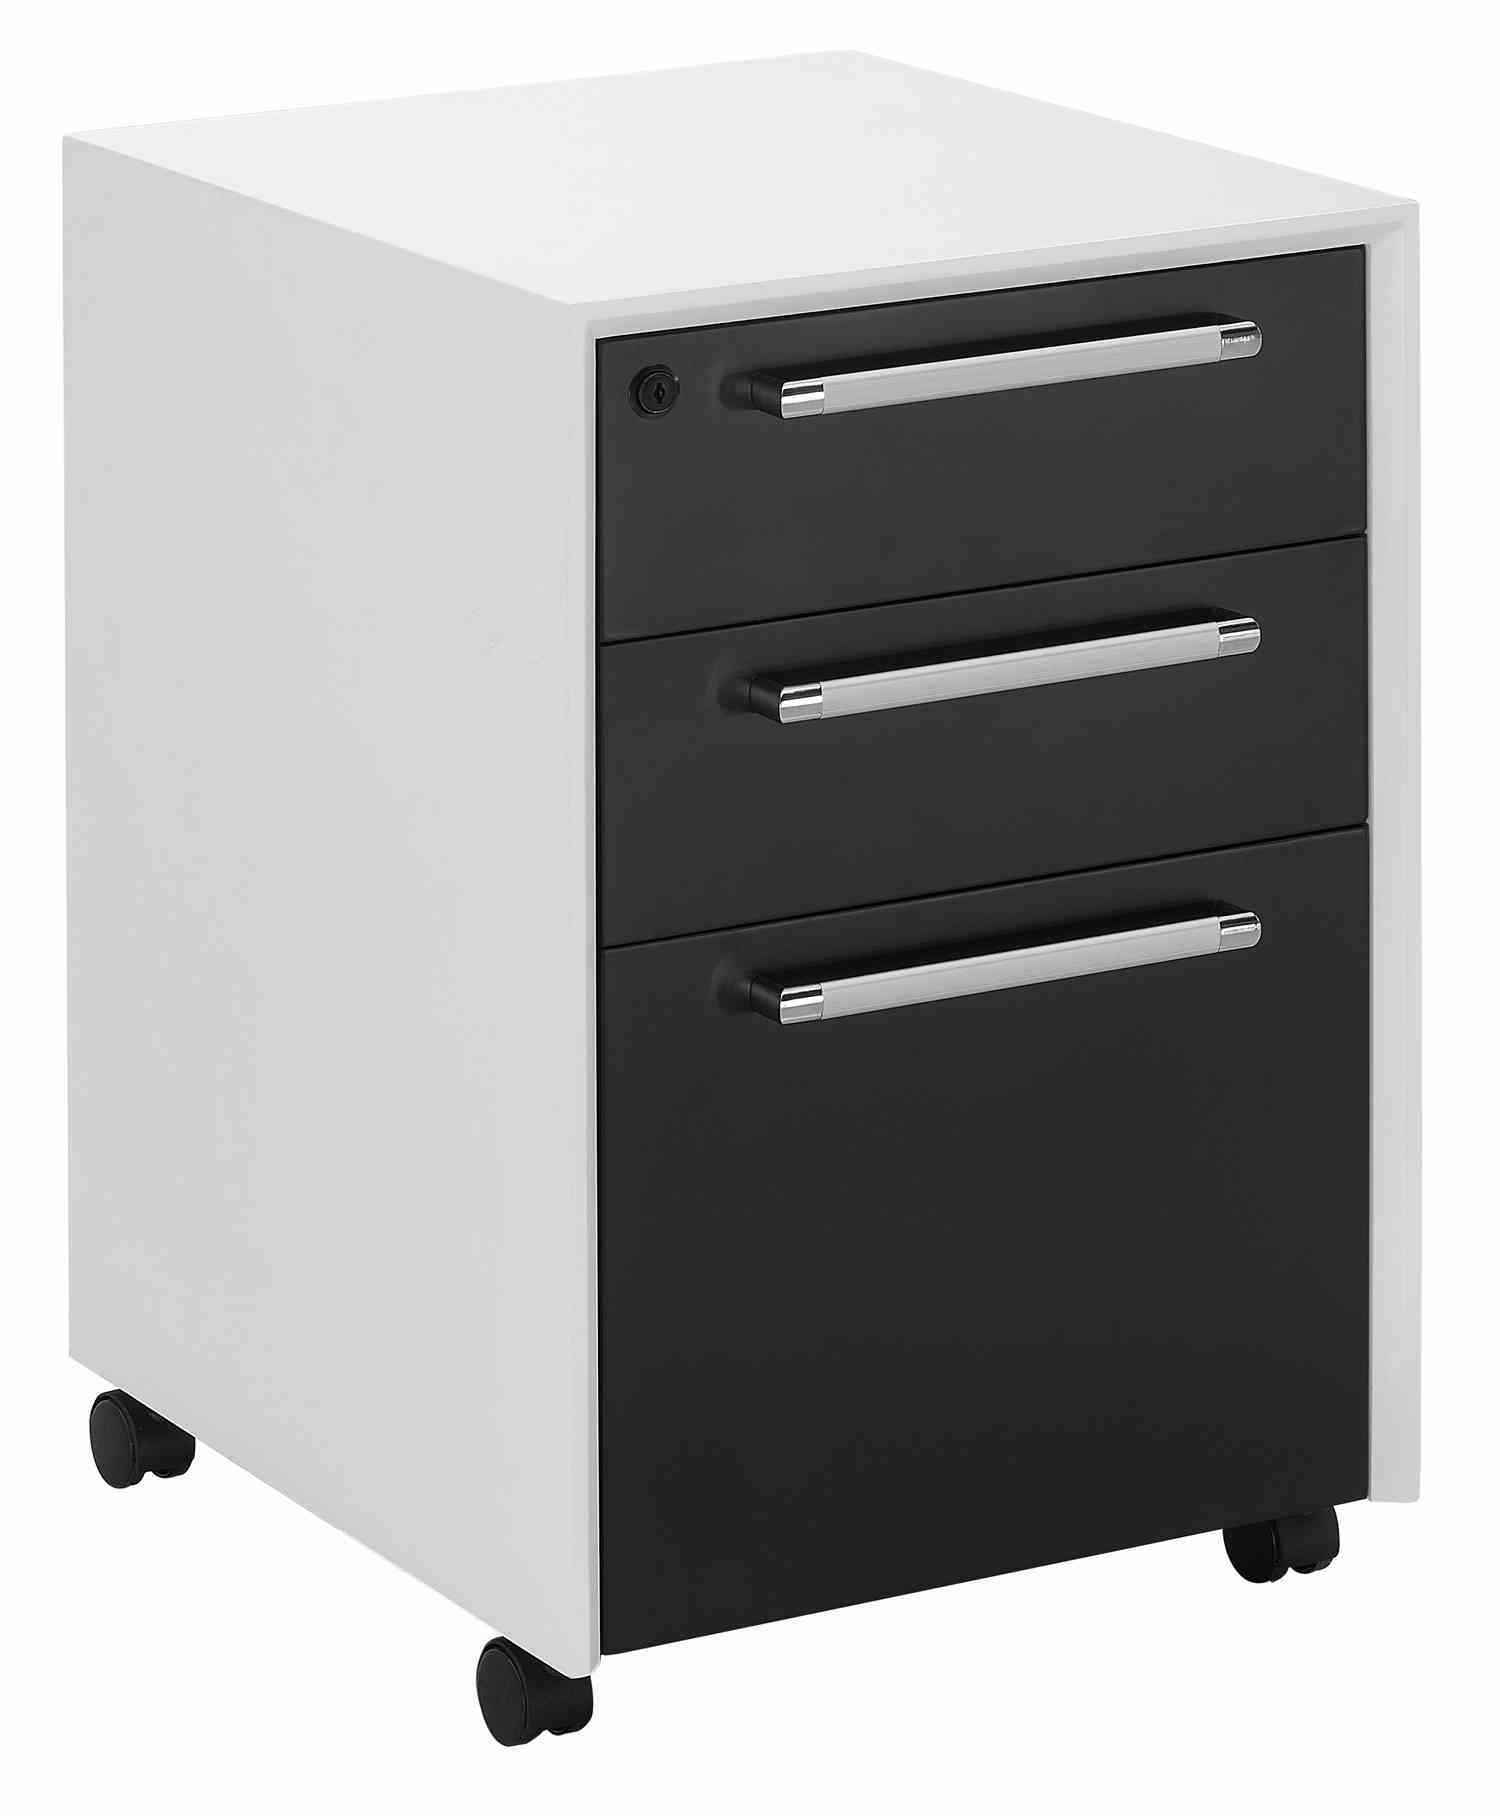 official photos 838a2 d33b8 [Hot Item] Mobile 3 Drawer Under Desk File Cabinet for Office